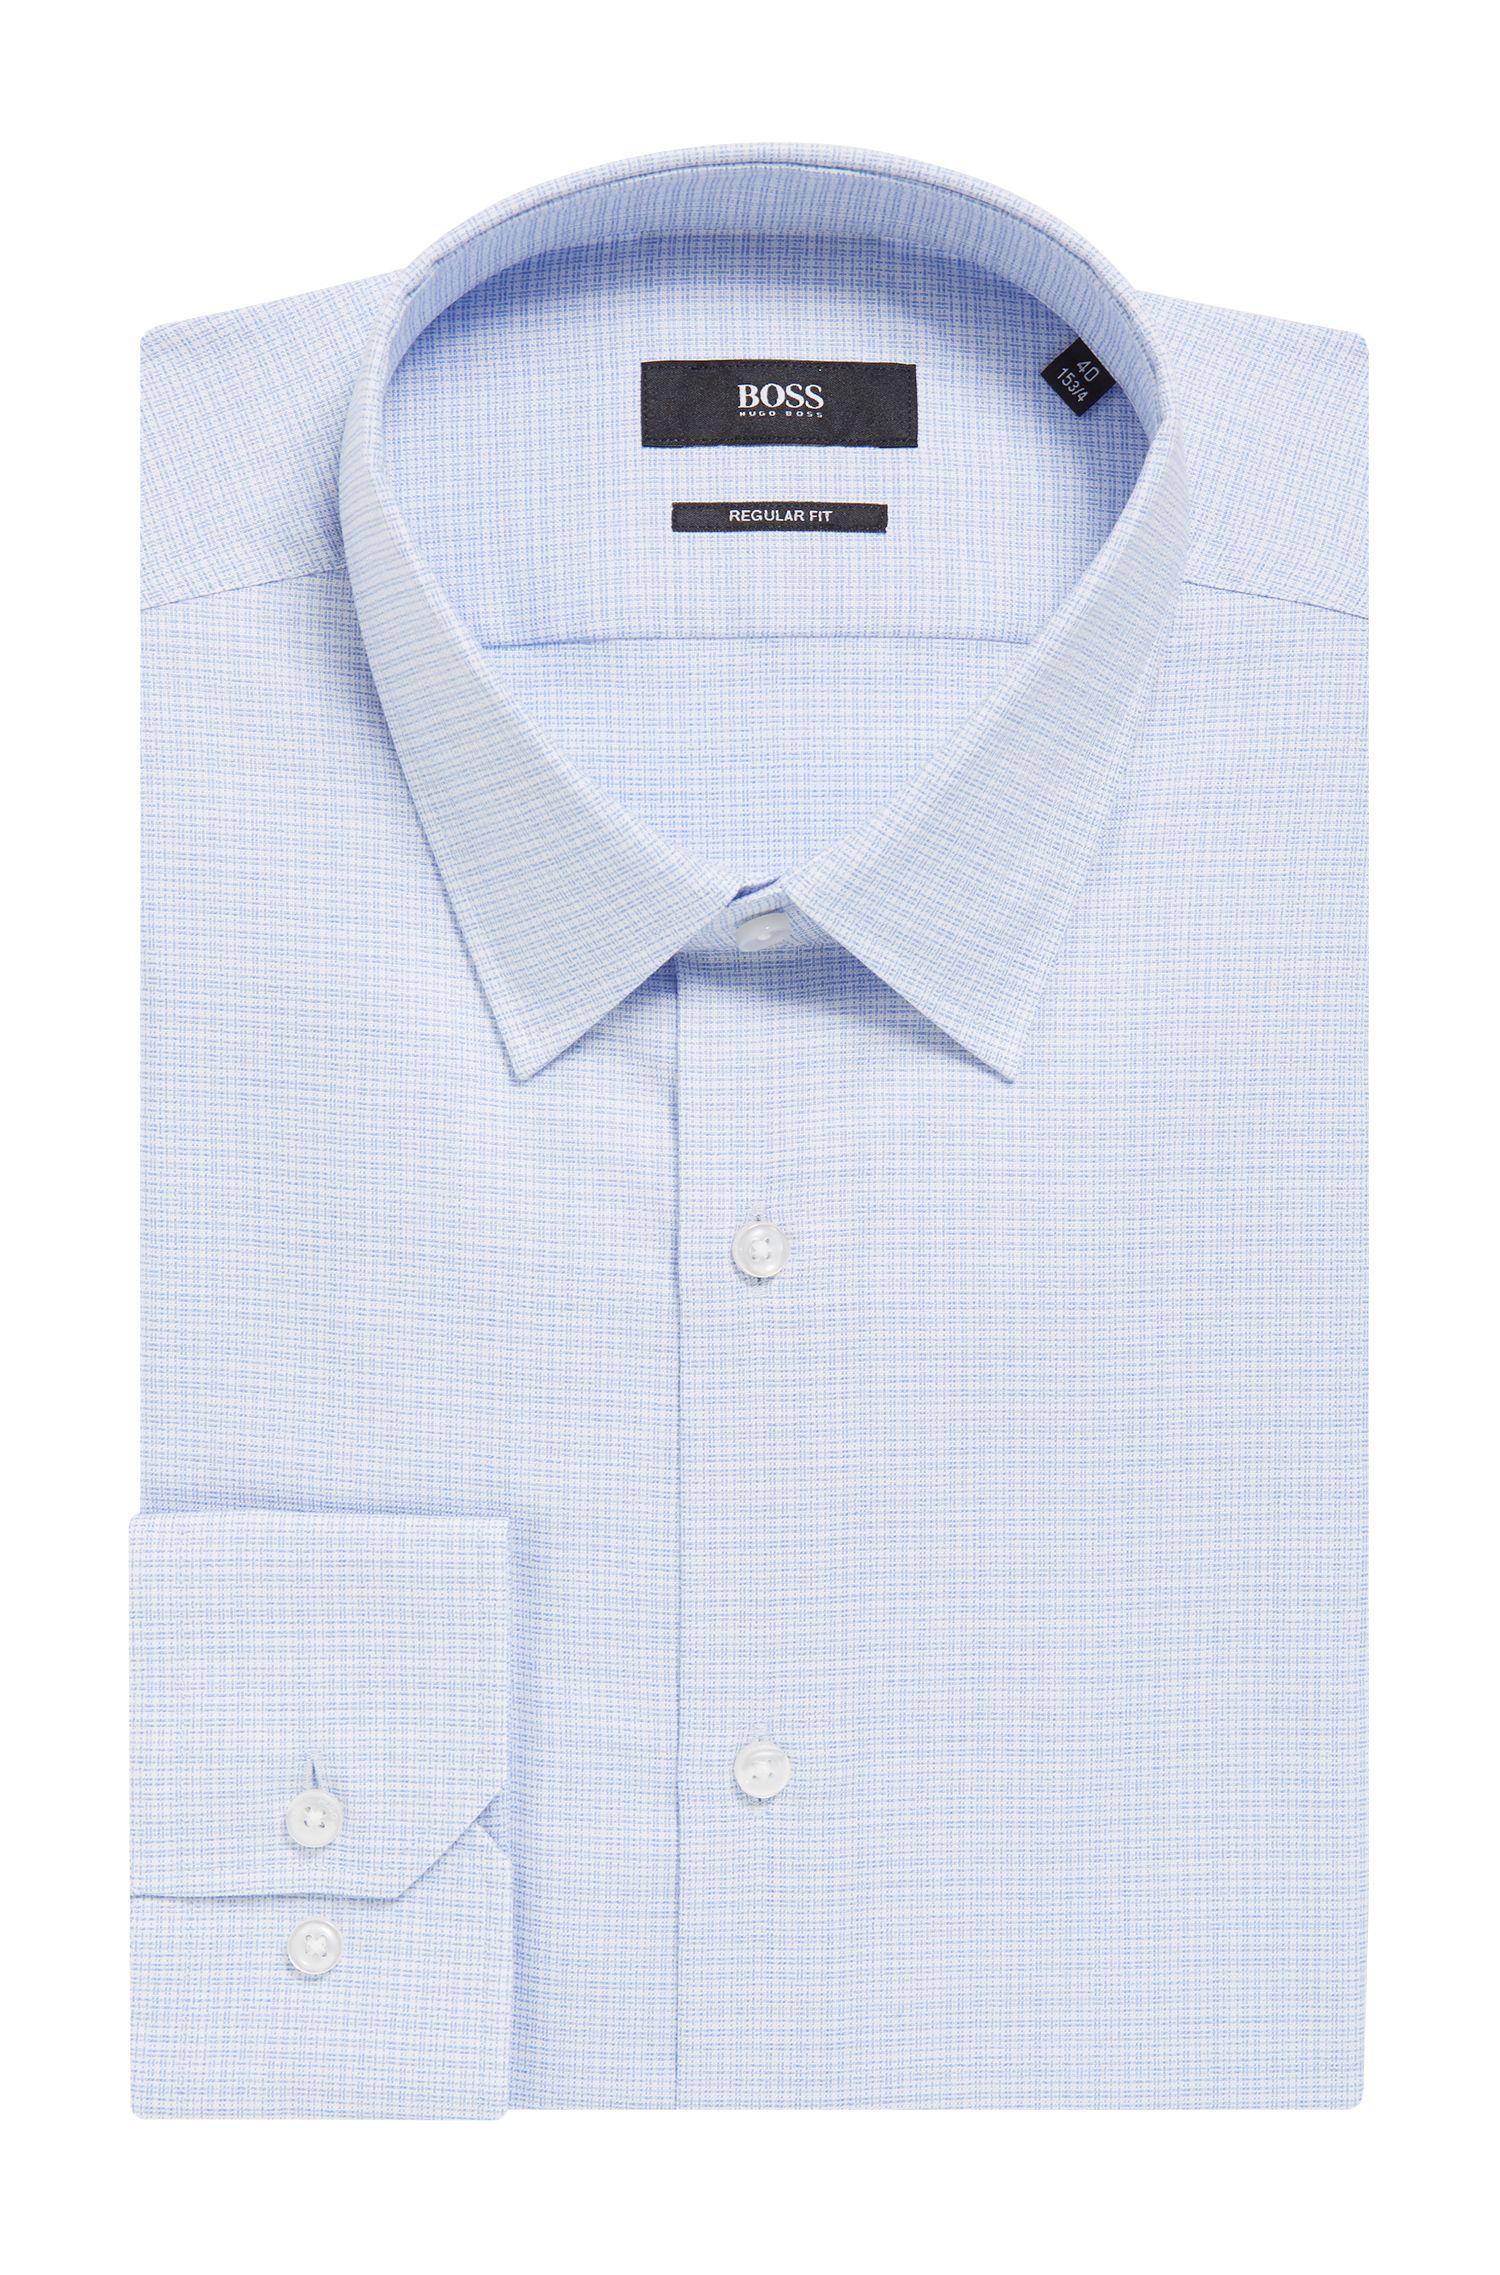 'Enzo'   Regular Fit, Crosshatch Easy Iron Cotton Dress Shirt